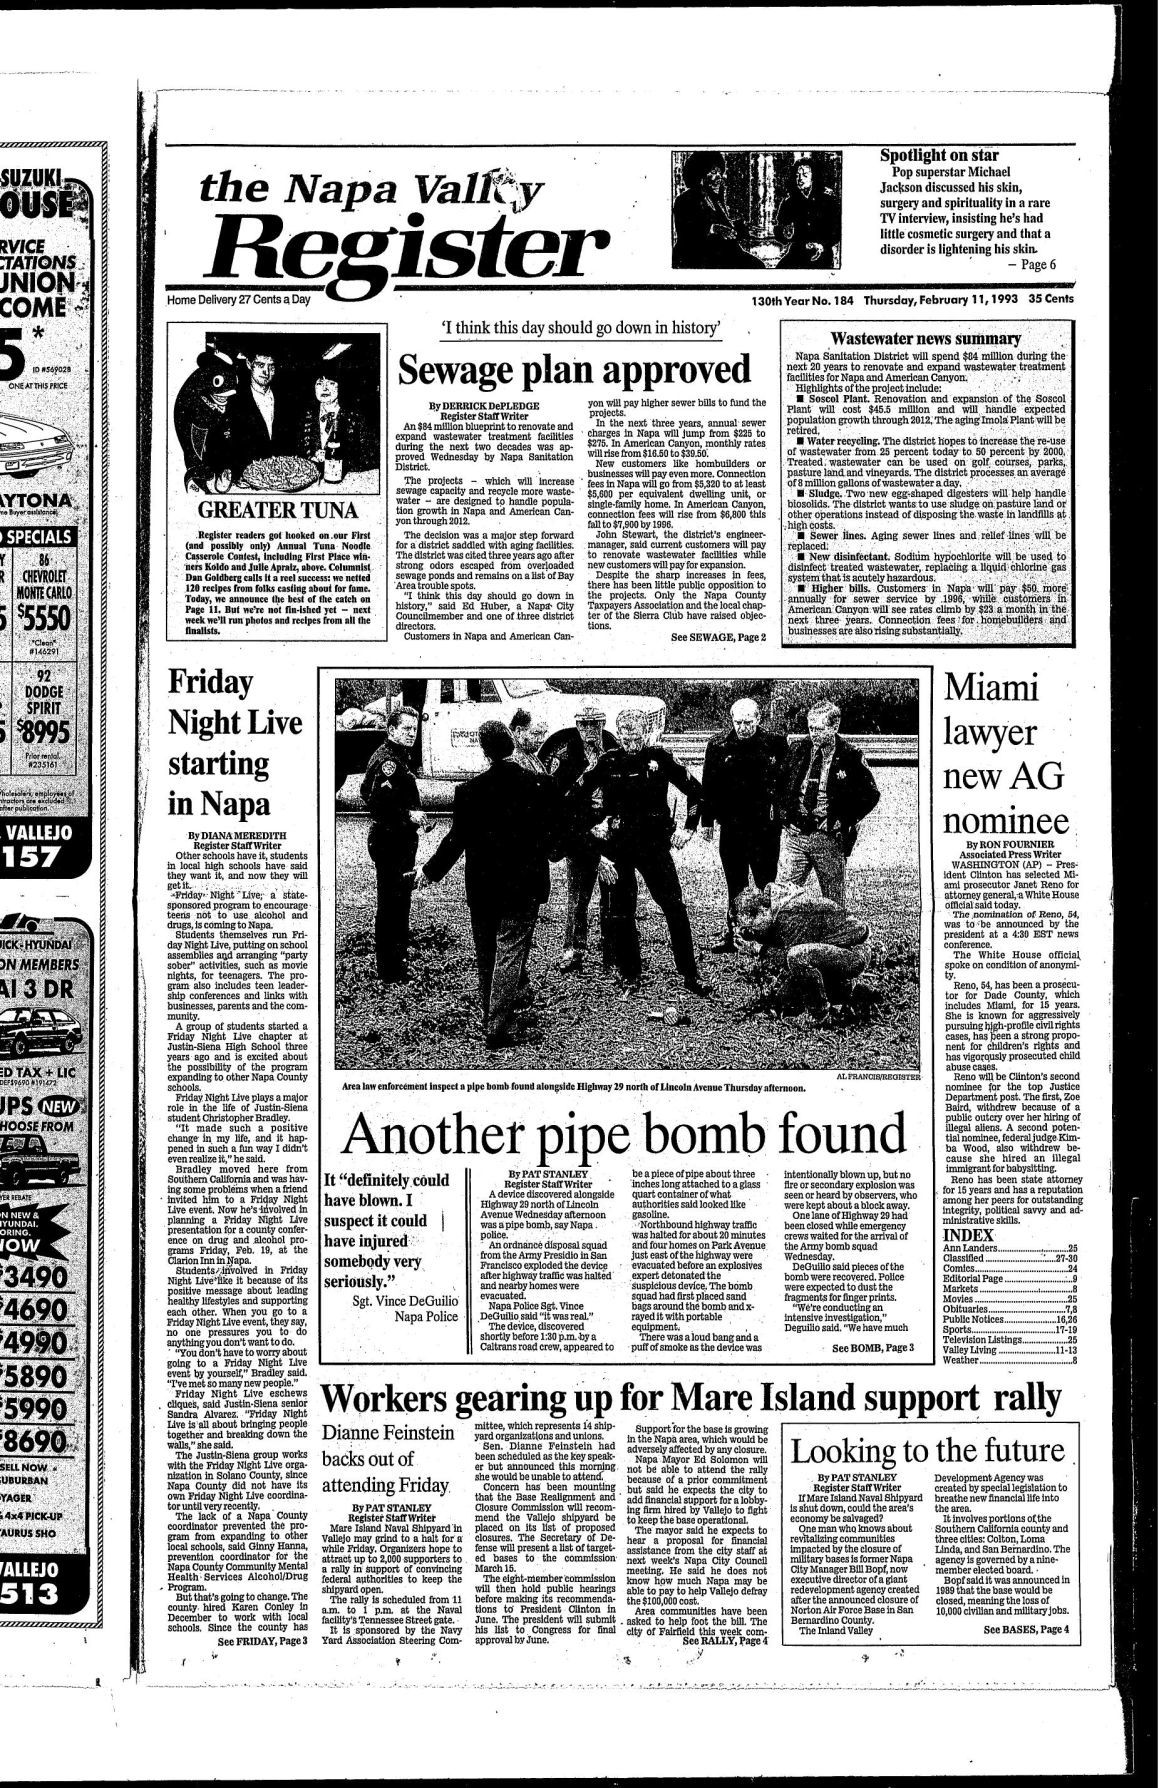 Feb. 11, 1993